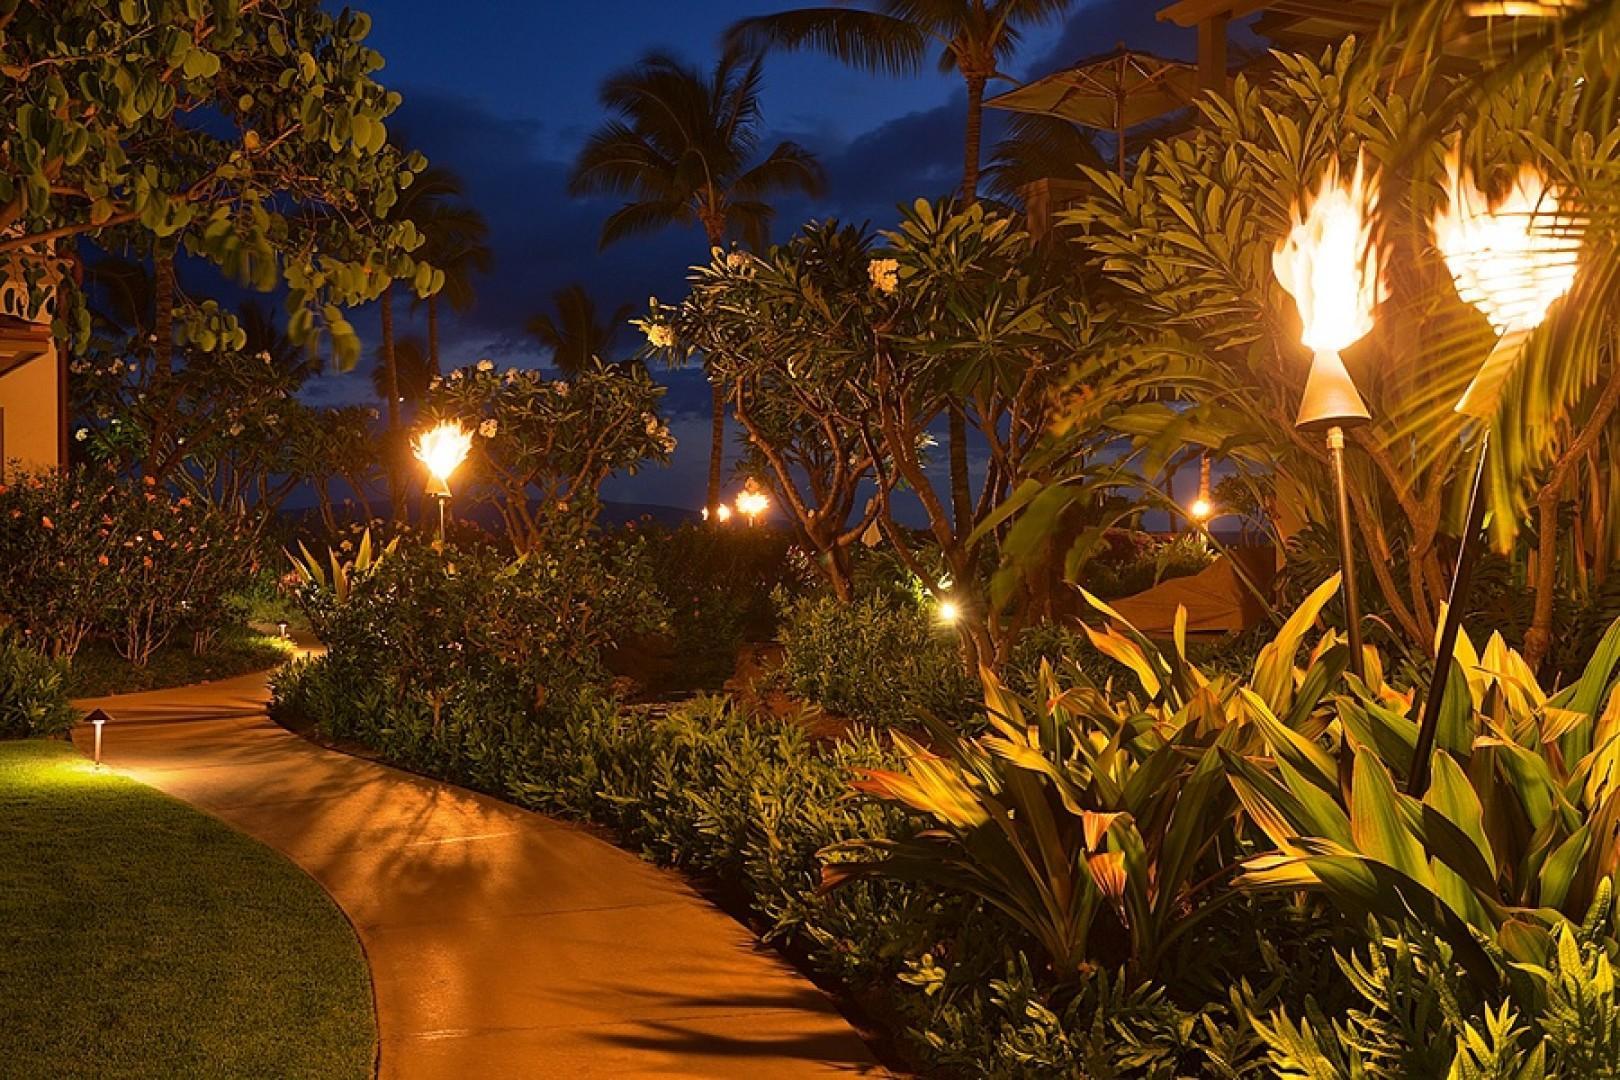 Tiki torches light the pathways throughout Wailea Beach Villas, from dusk to dawn.